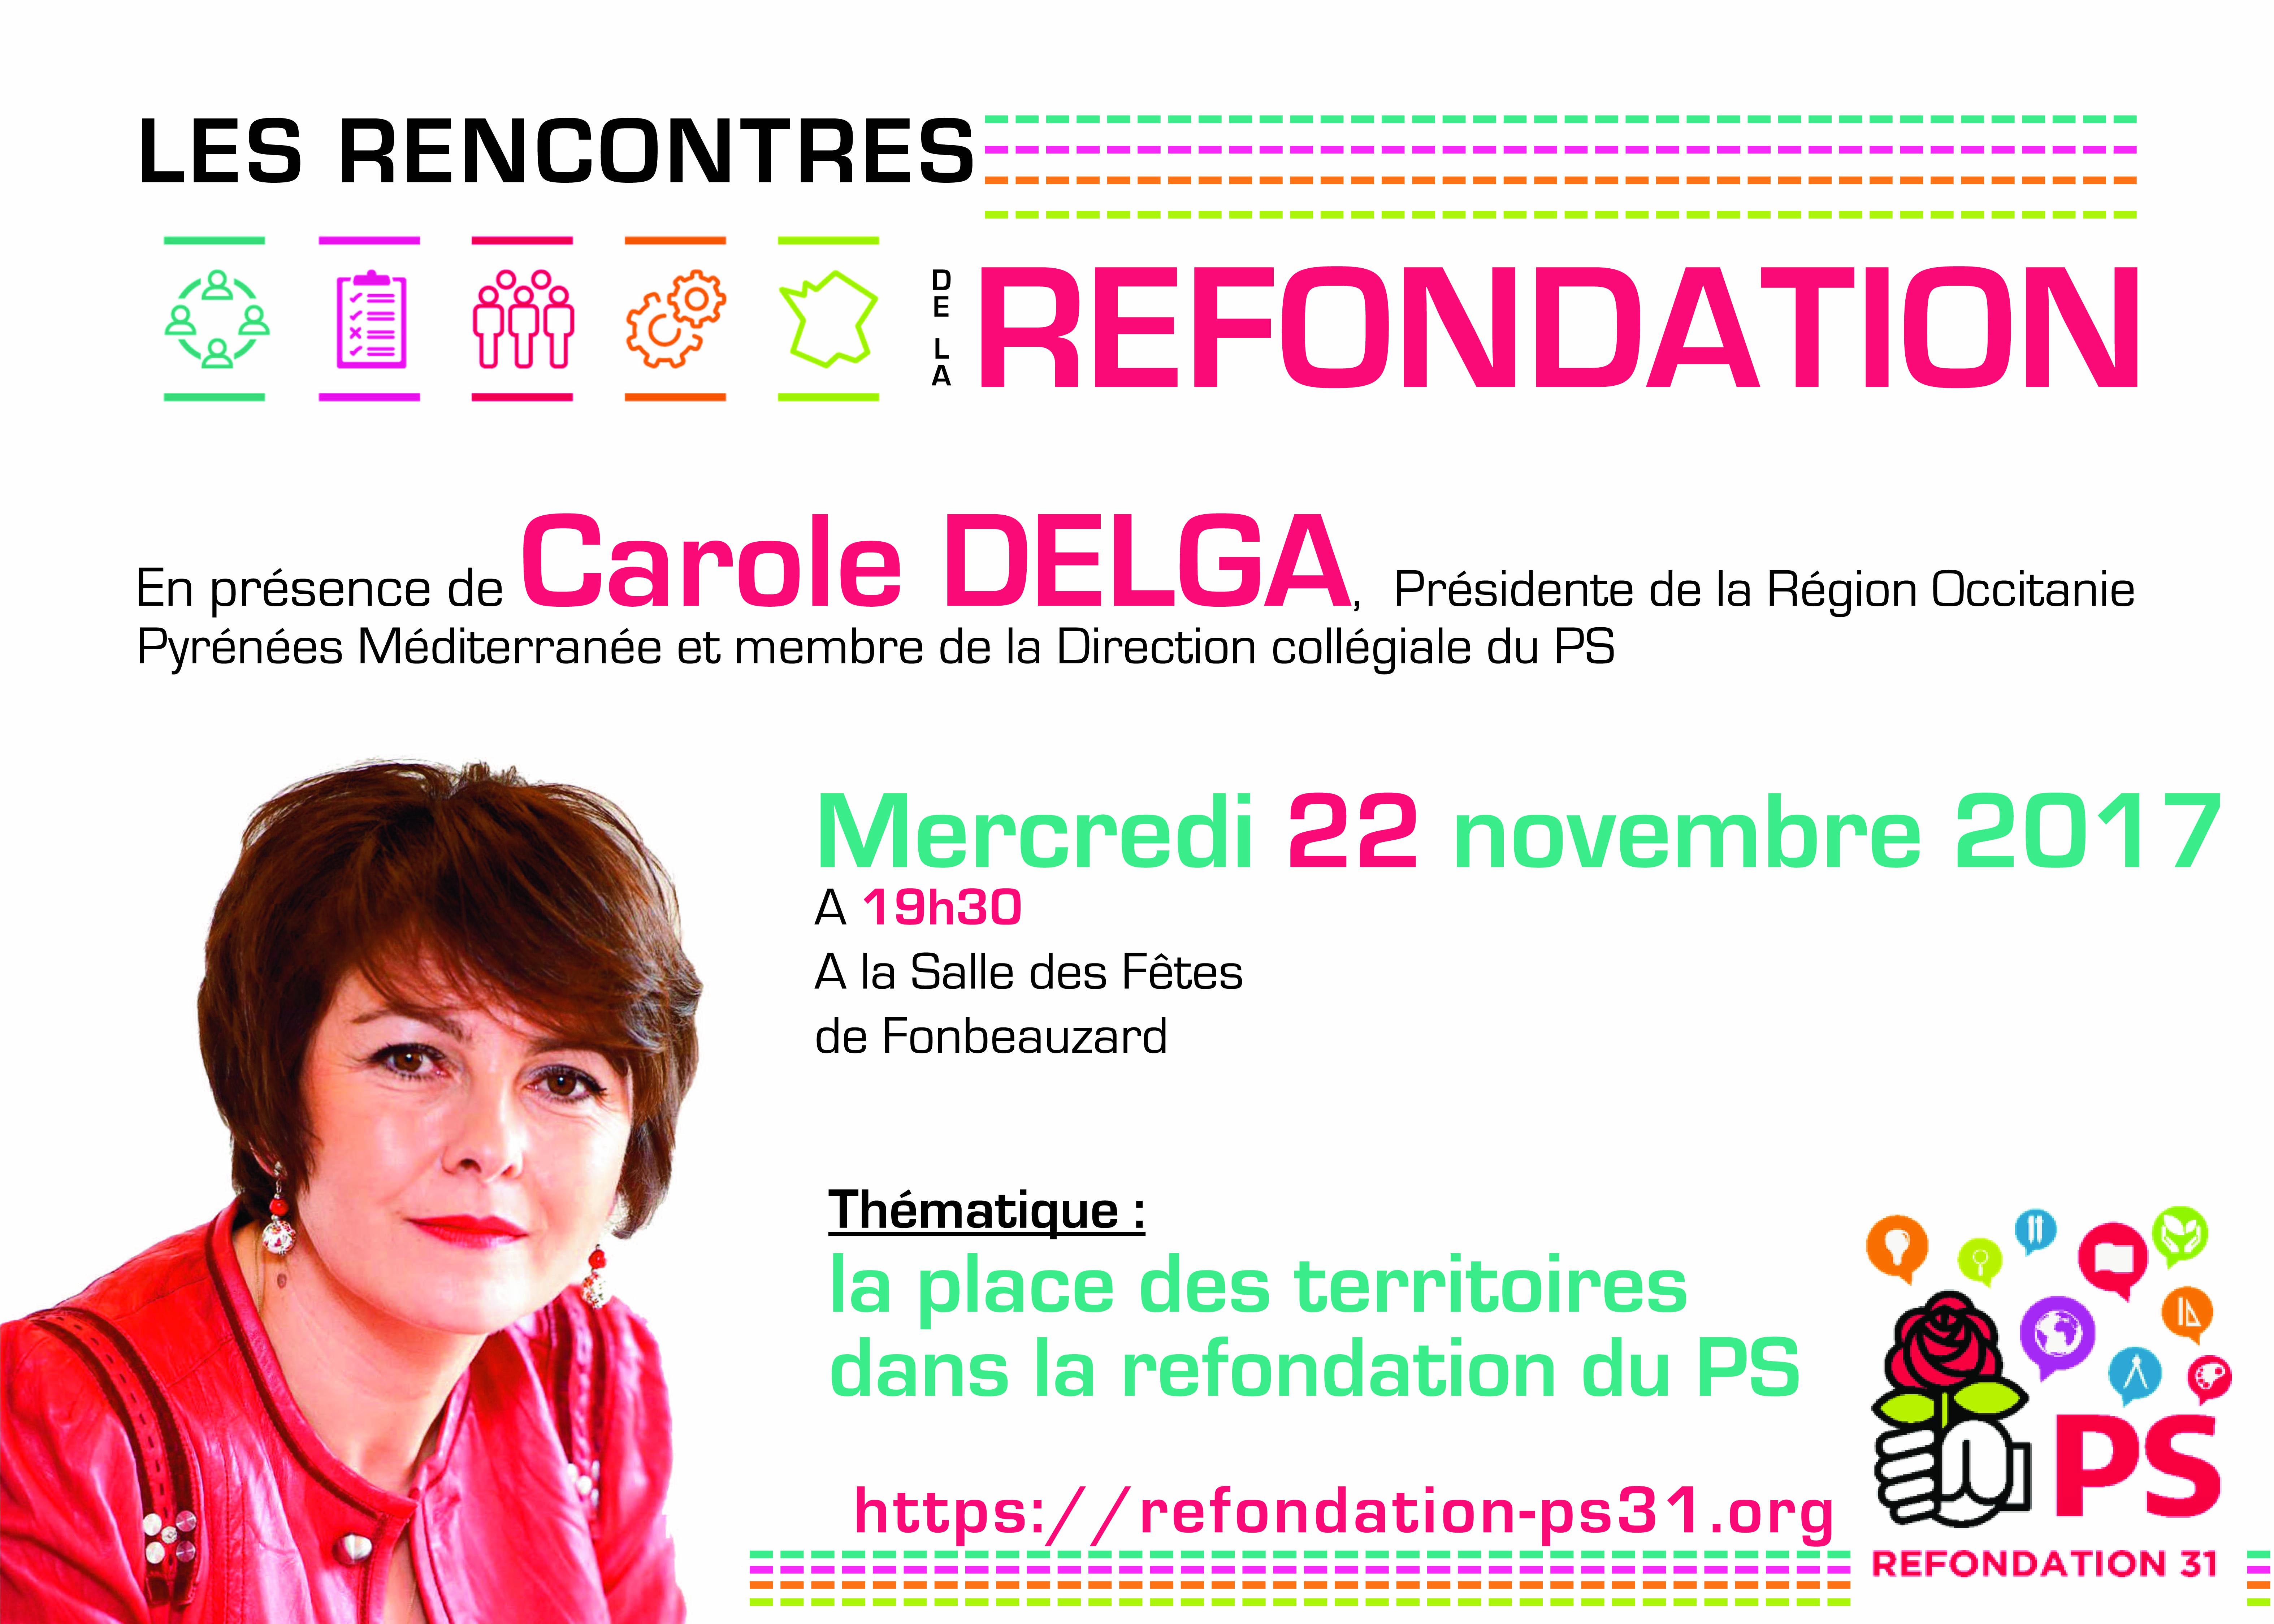 Refondation #PS31 - AG de Circonscription - avec Carole Delga